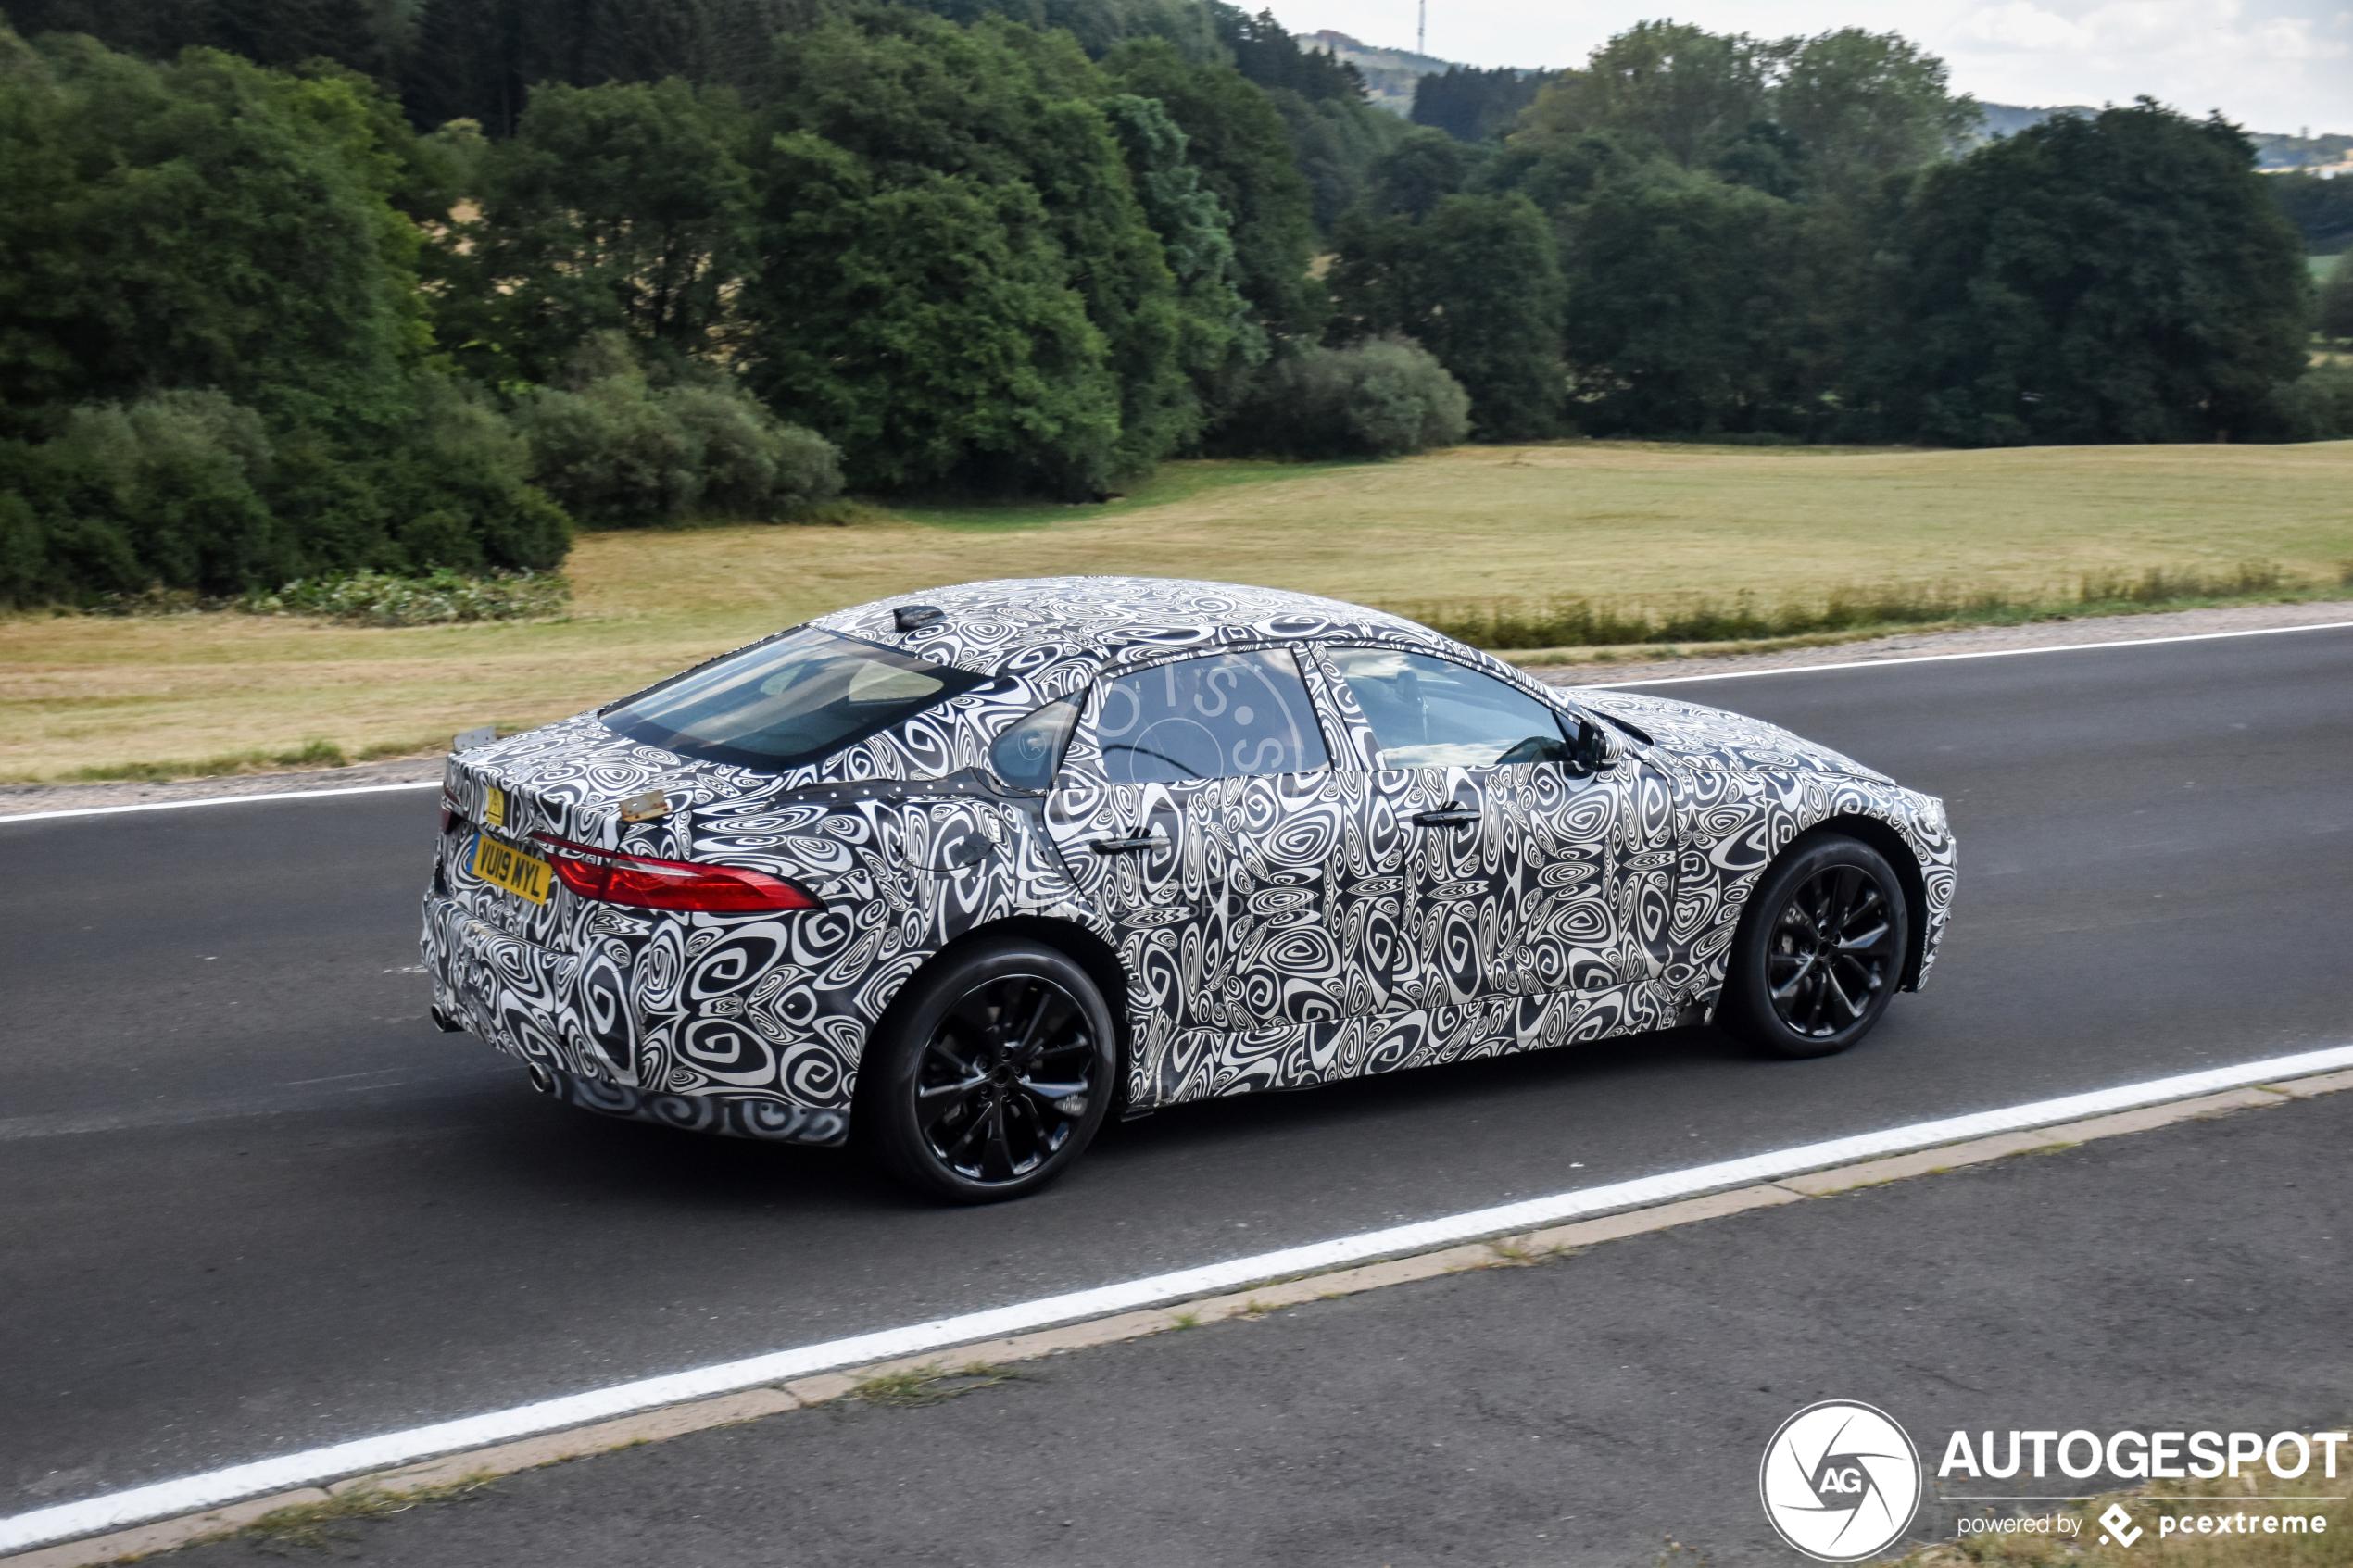 2020 - [Jaguar] XJ [X360] - Page 3 Jaguar-xj-electric-c499722082020210629-3